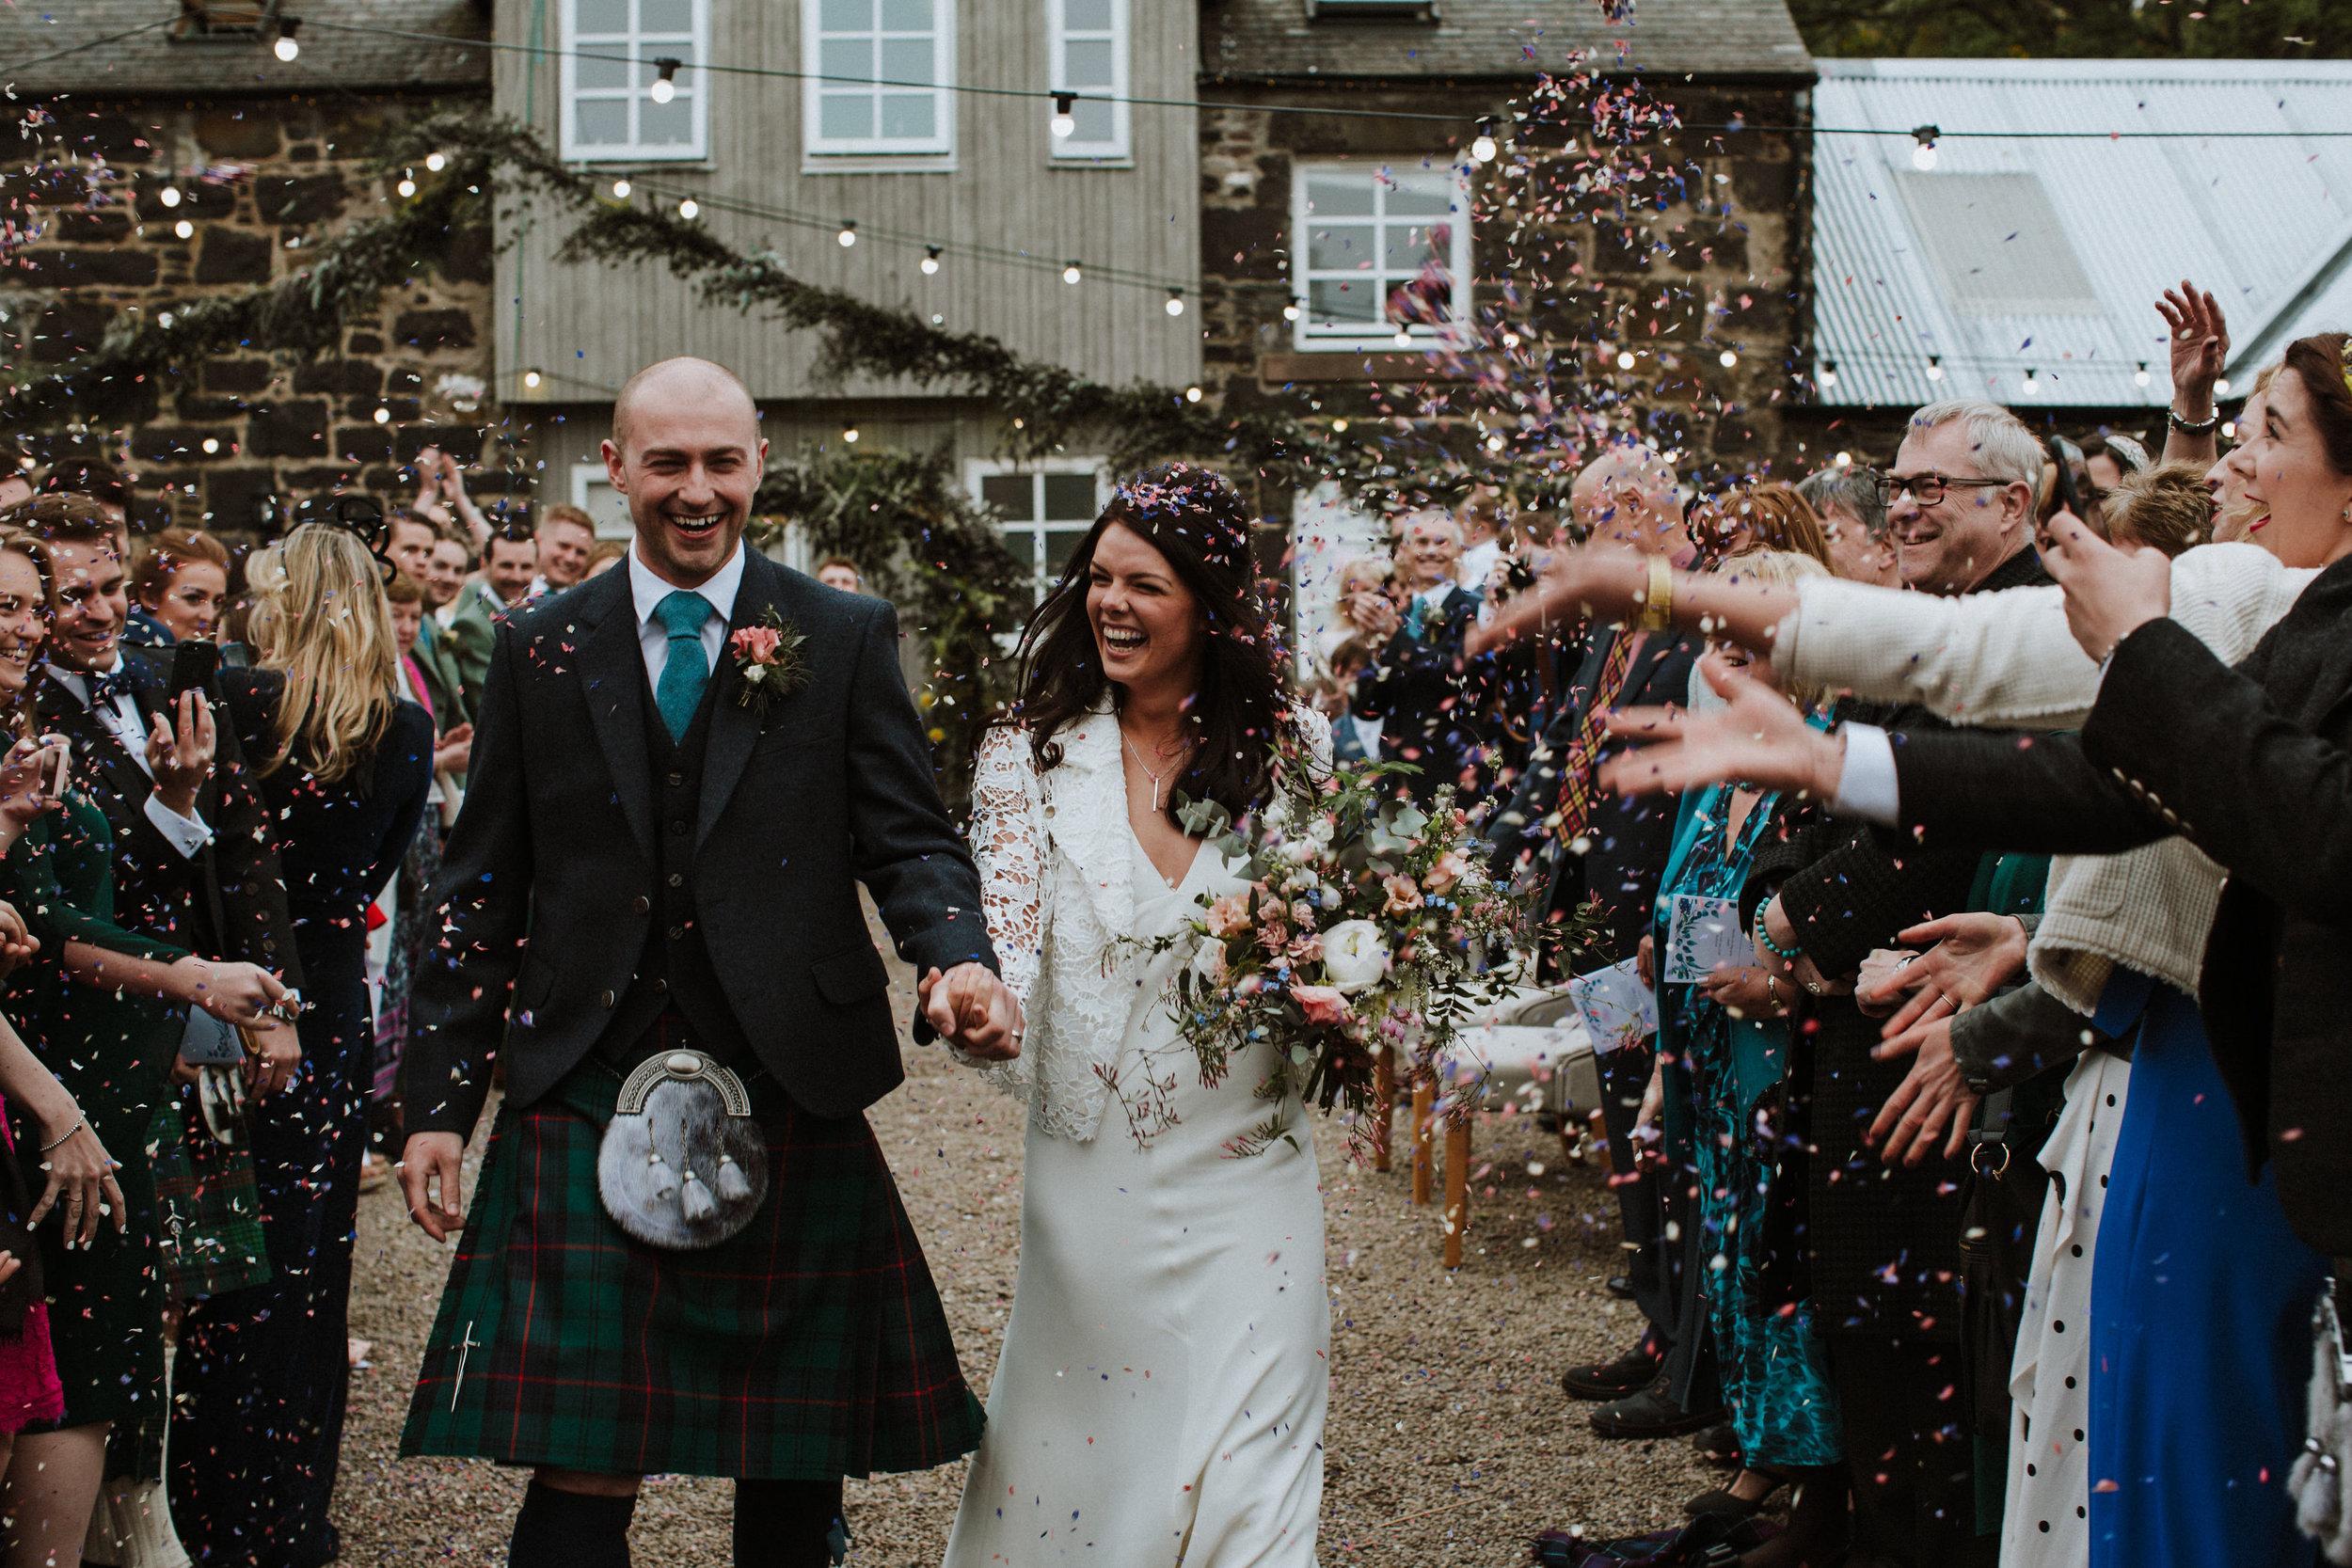 Katt-Scotland-Comrie-Crieff-Bias-Crepe-Wedding-Gown-Lace-Bridal-Biker-Jacket-Bespoke-Susanna-Greening-Derbyshire-15